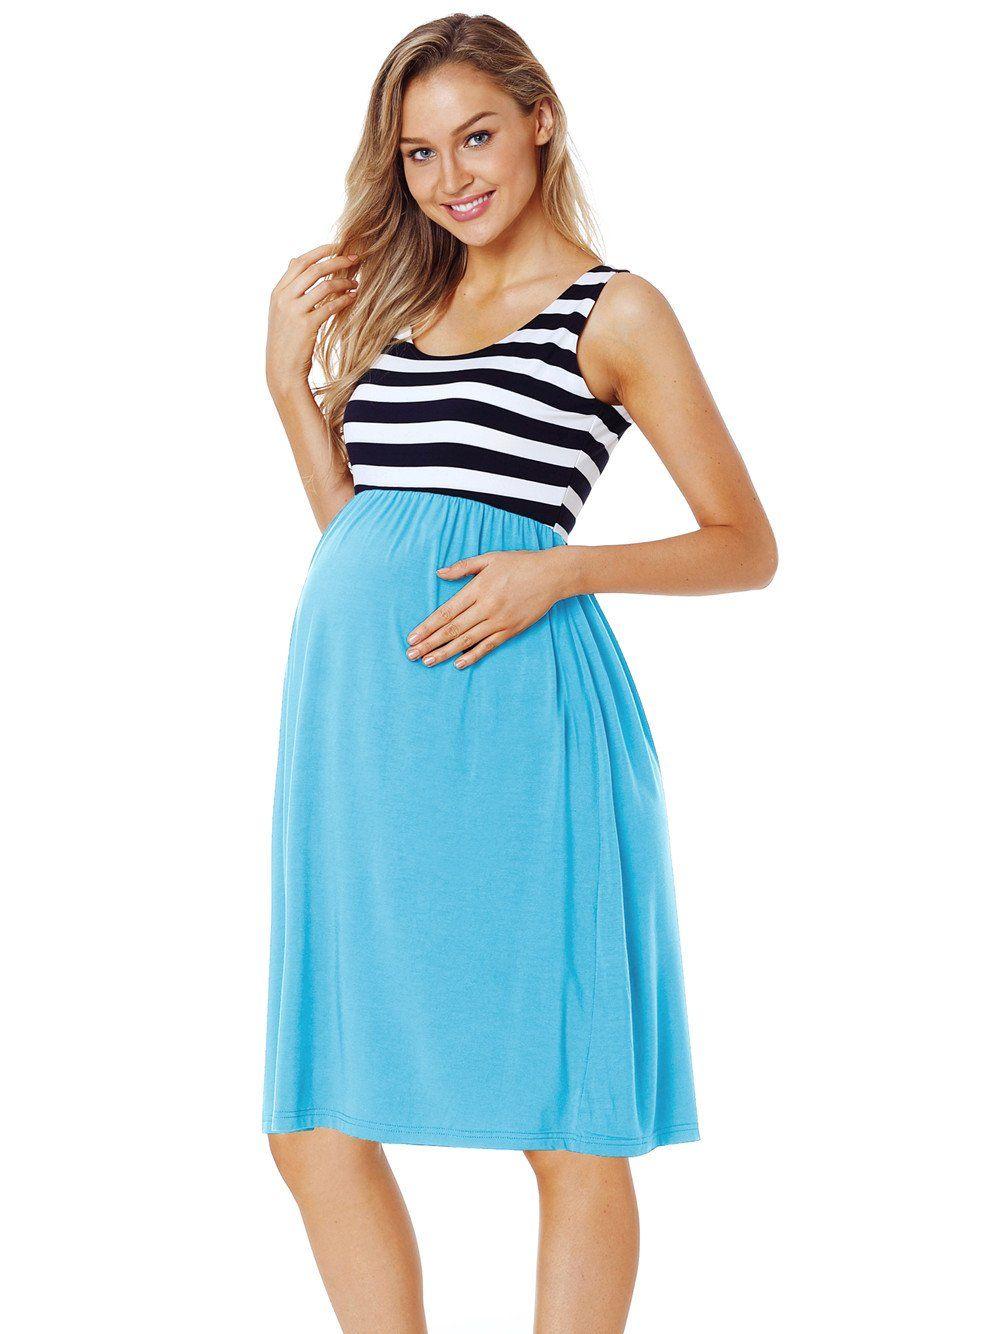 486f8003ad796 Maternity Dresses - CareGabi Maternity Tank Dress Womens Sleeveless Stripe  Knee Length Tank Dress for Baby Shower M Stripe Sky Blue ** See this  wonderful ...